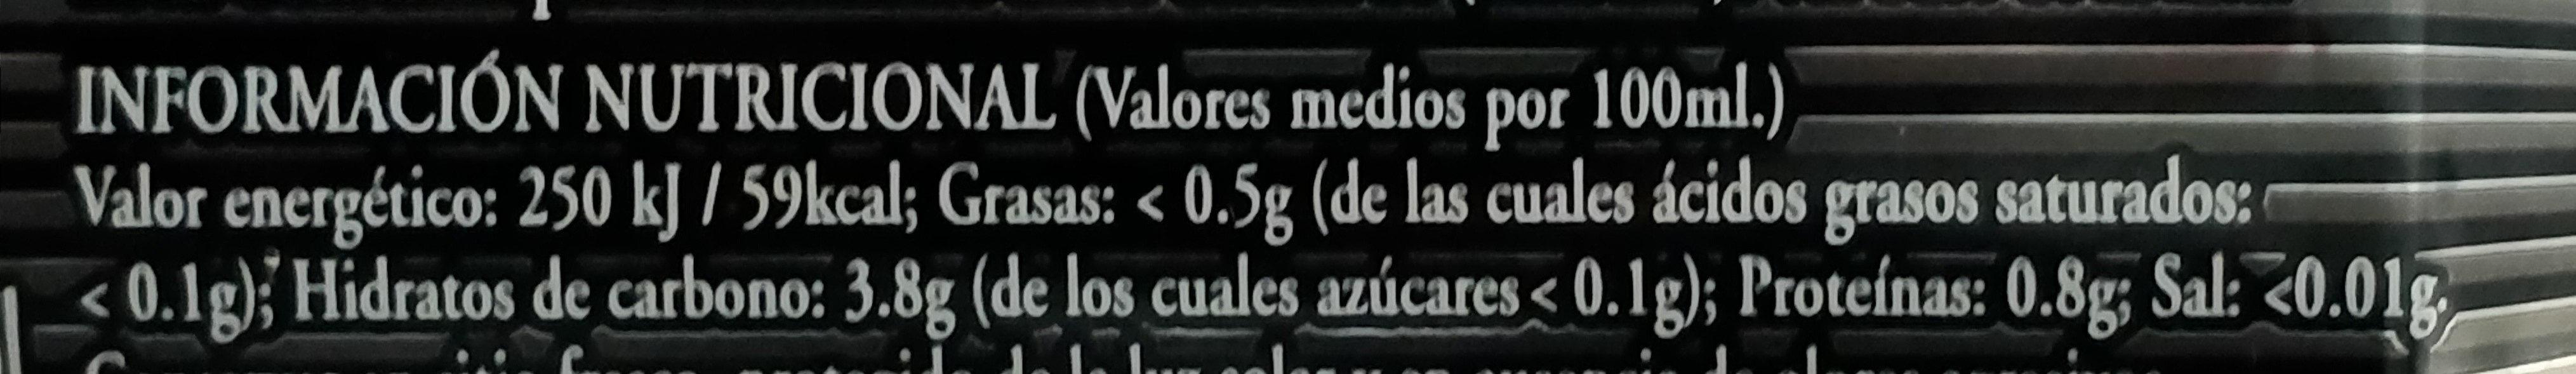 Cerveza negra Steinburg - Información nutricional